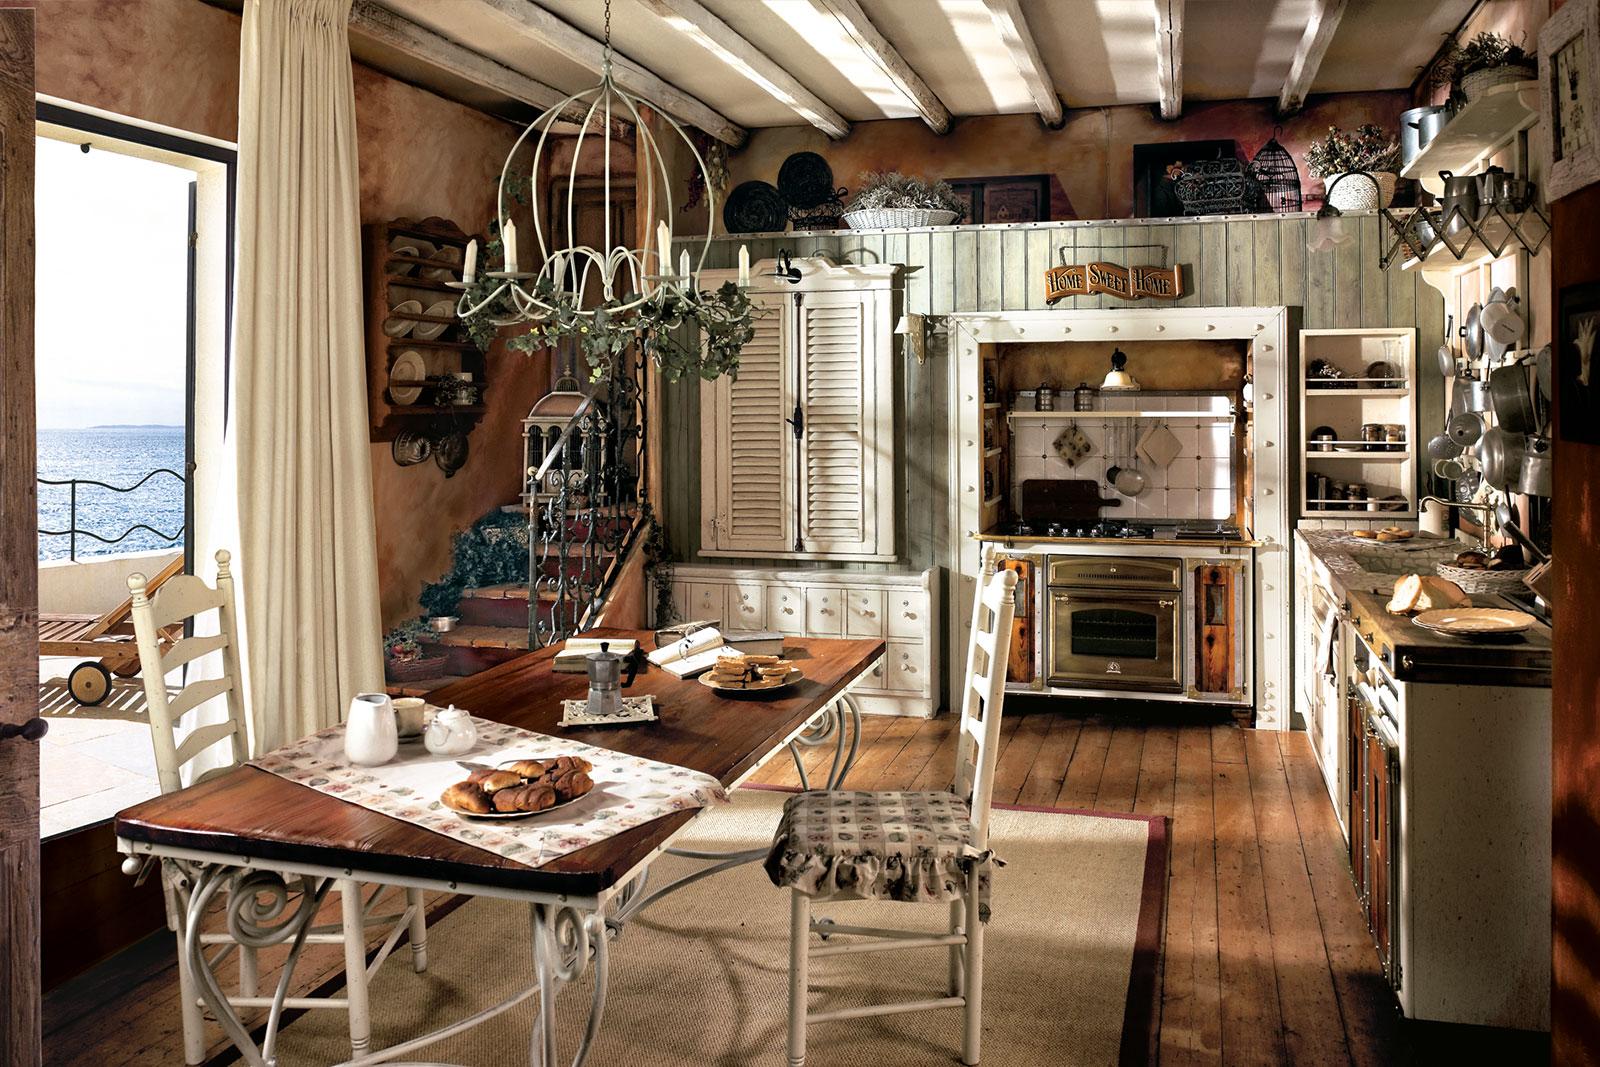 Full Size of Rustikales Bett Esstisch Rustikal Holz Küche Regal Küchen Rustikaler Wohnzimmer Küchen Rustikal